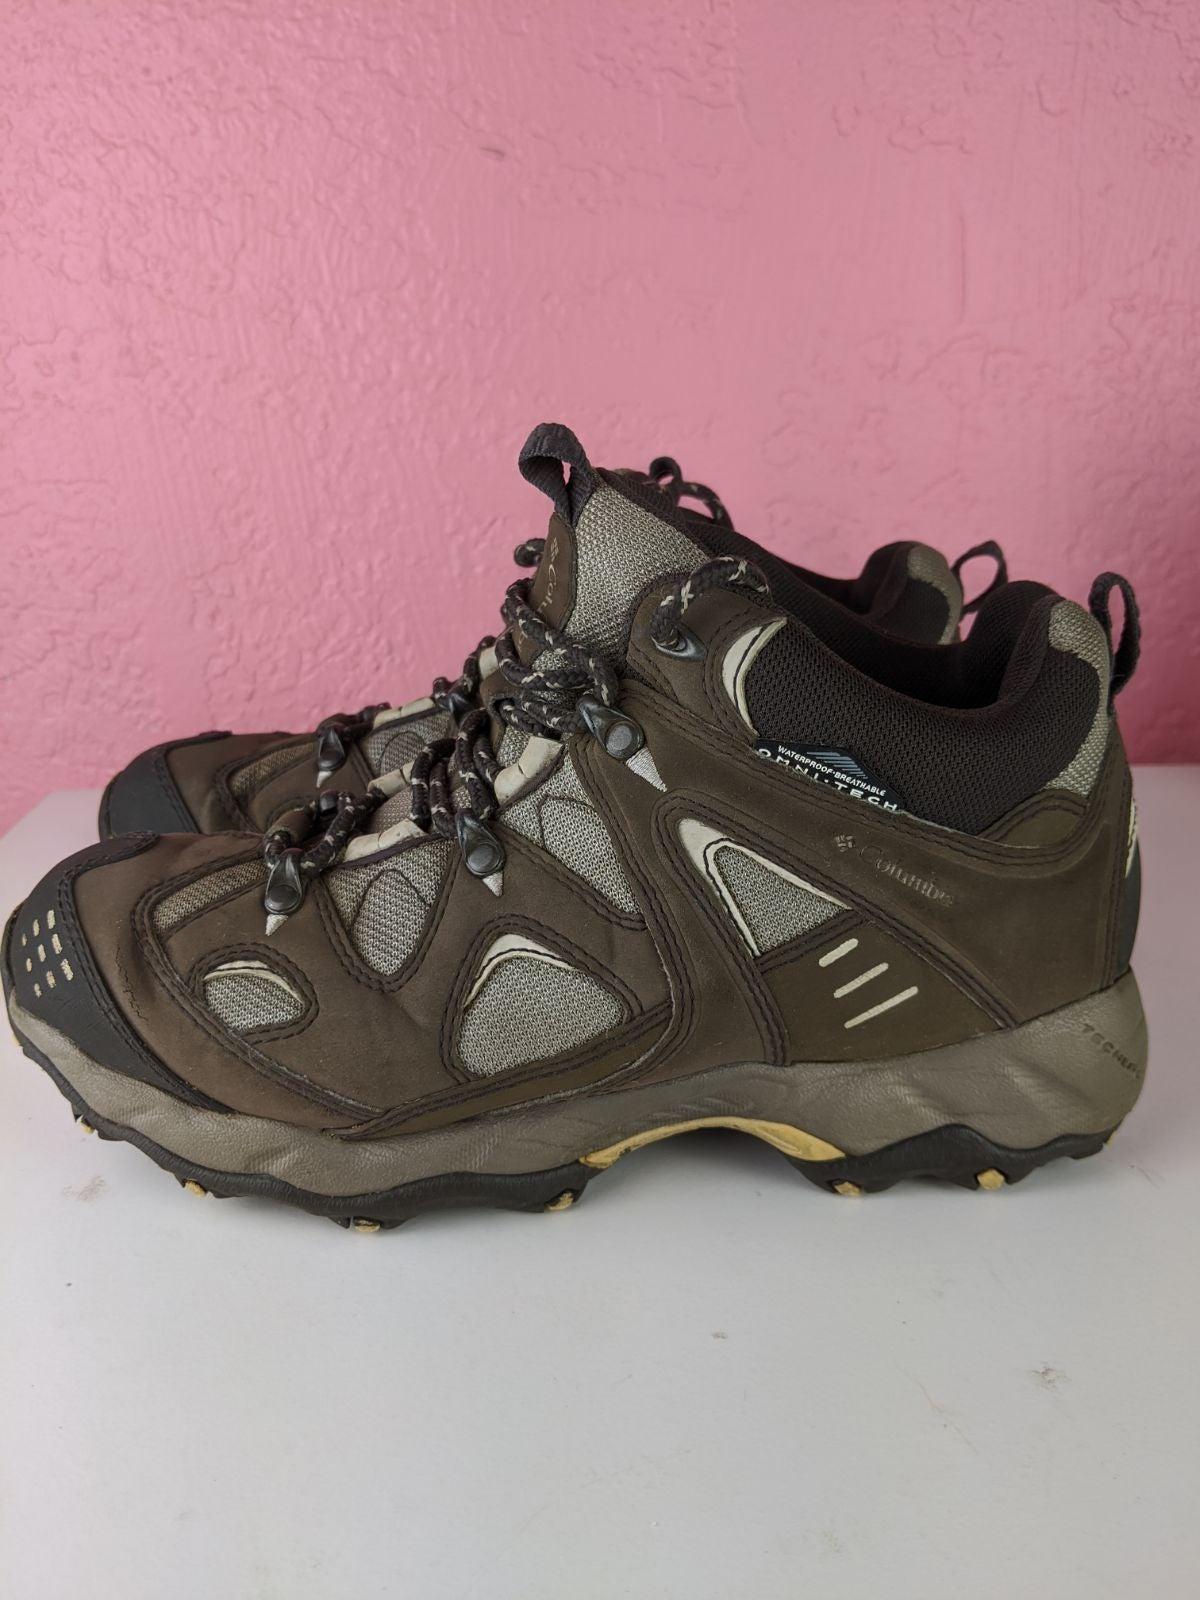 Columbia waterproof hiking boots women's